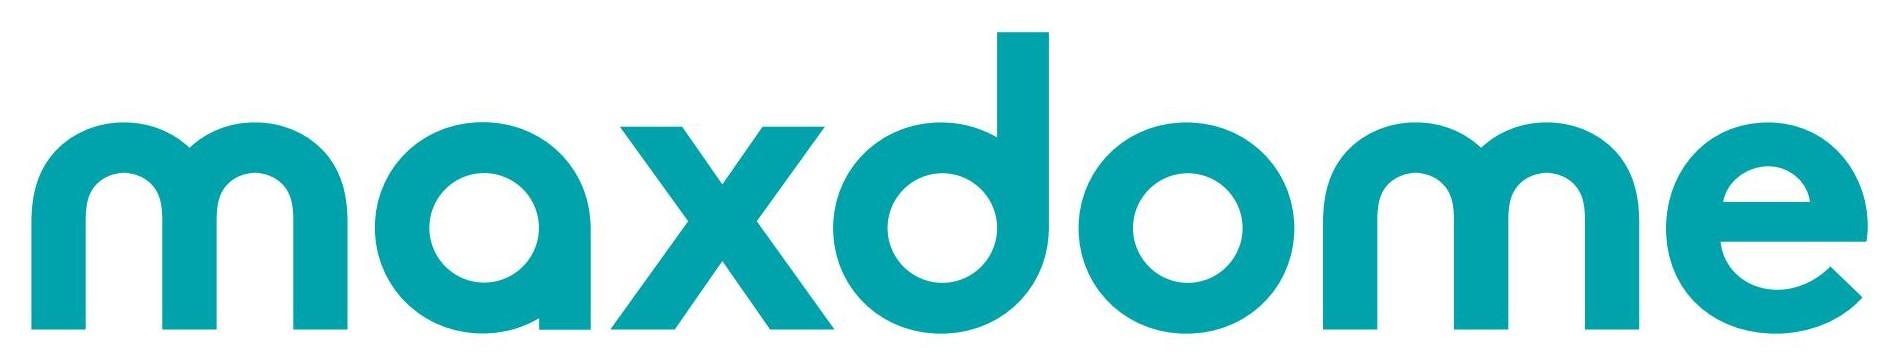 Maxdome Logo png